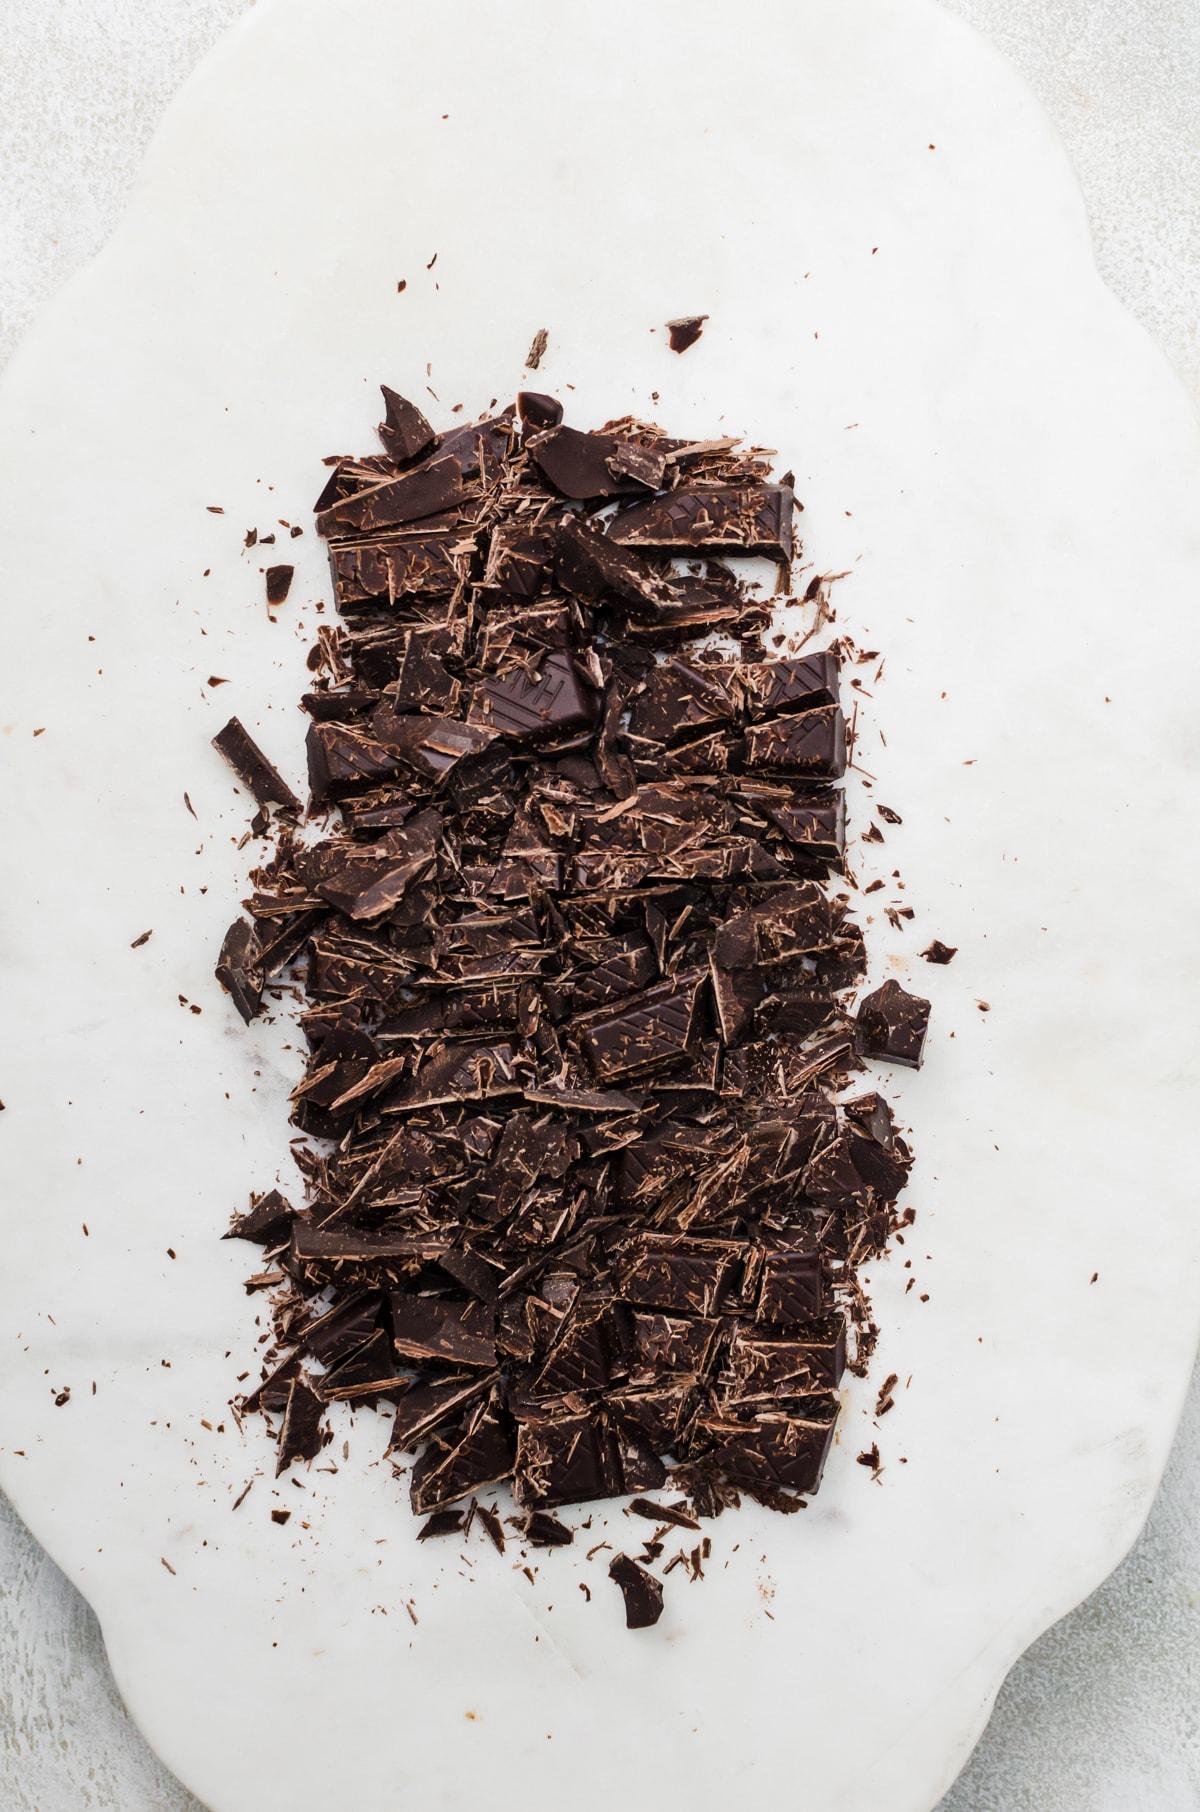 chocolate chopped on board